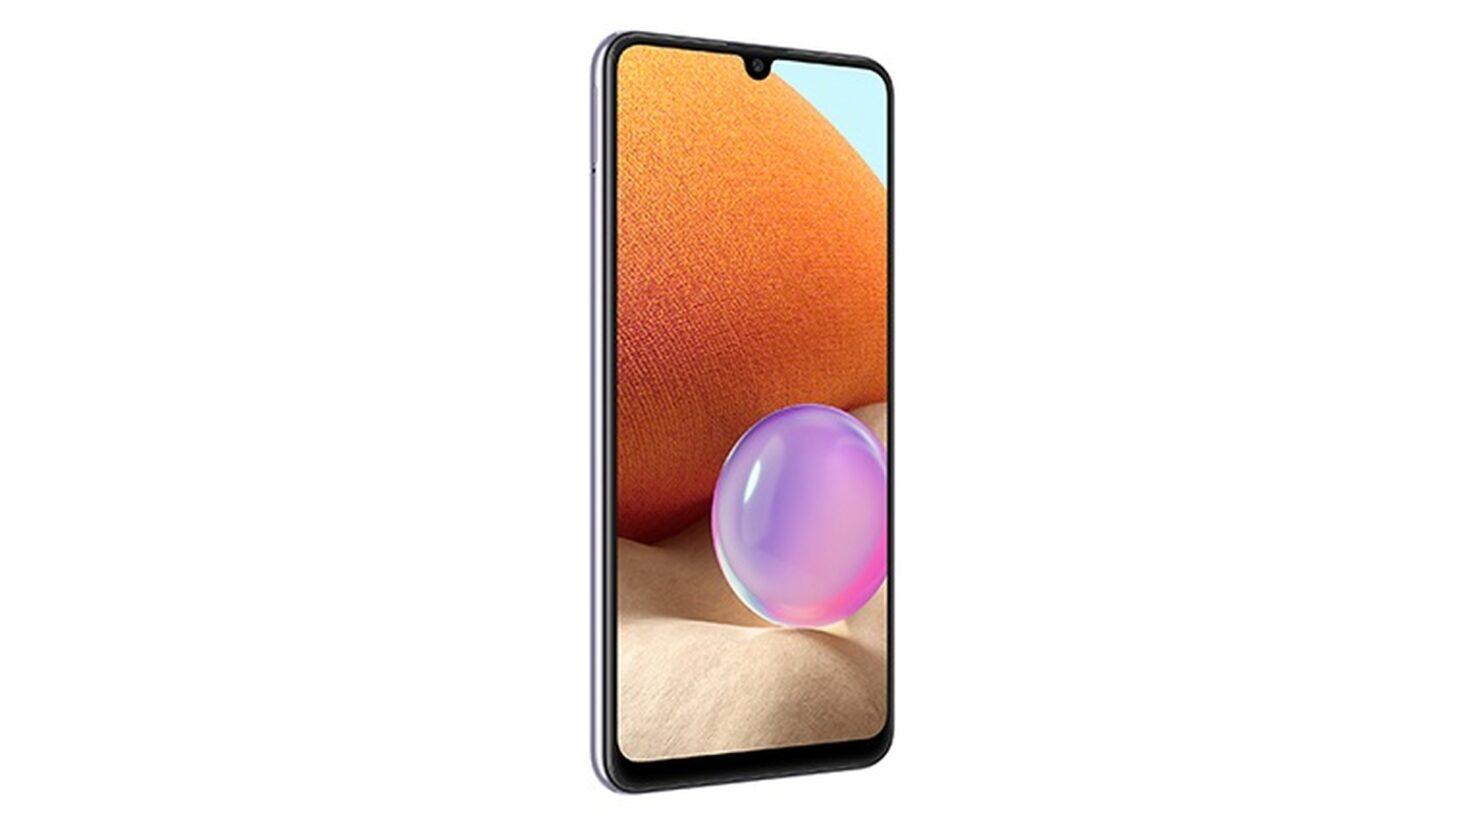 Galaxy A32 4G Brings 90Hz Display, AMOLED Panel, In-Display Fingerprint Reader and More